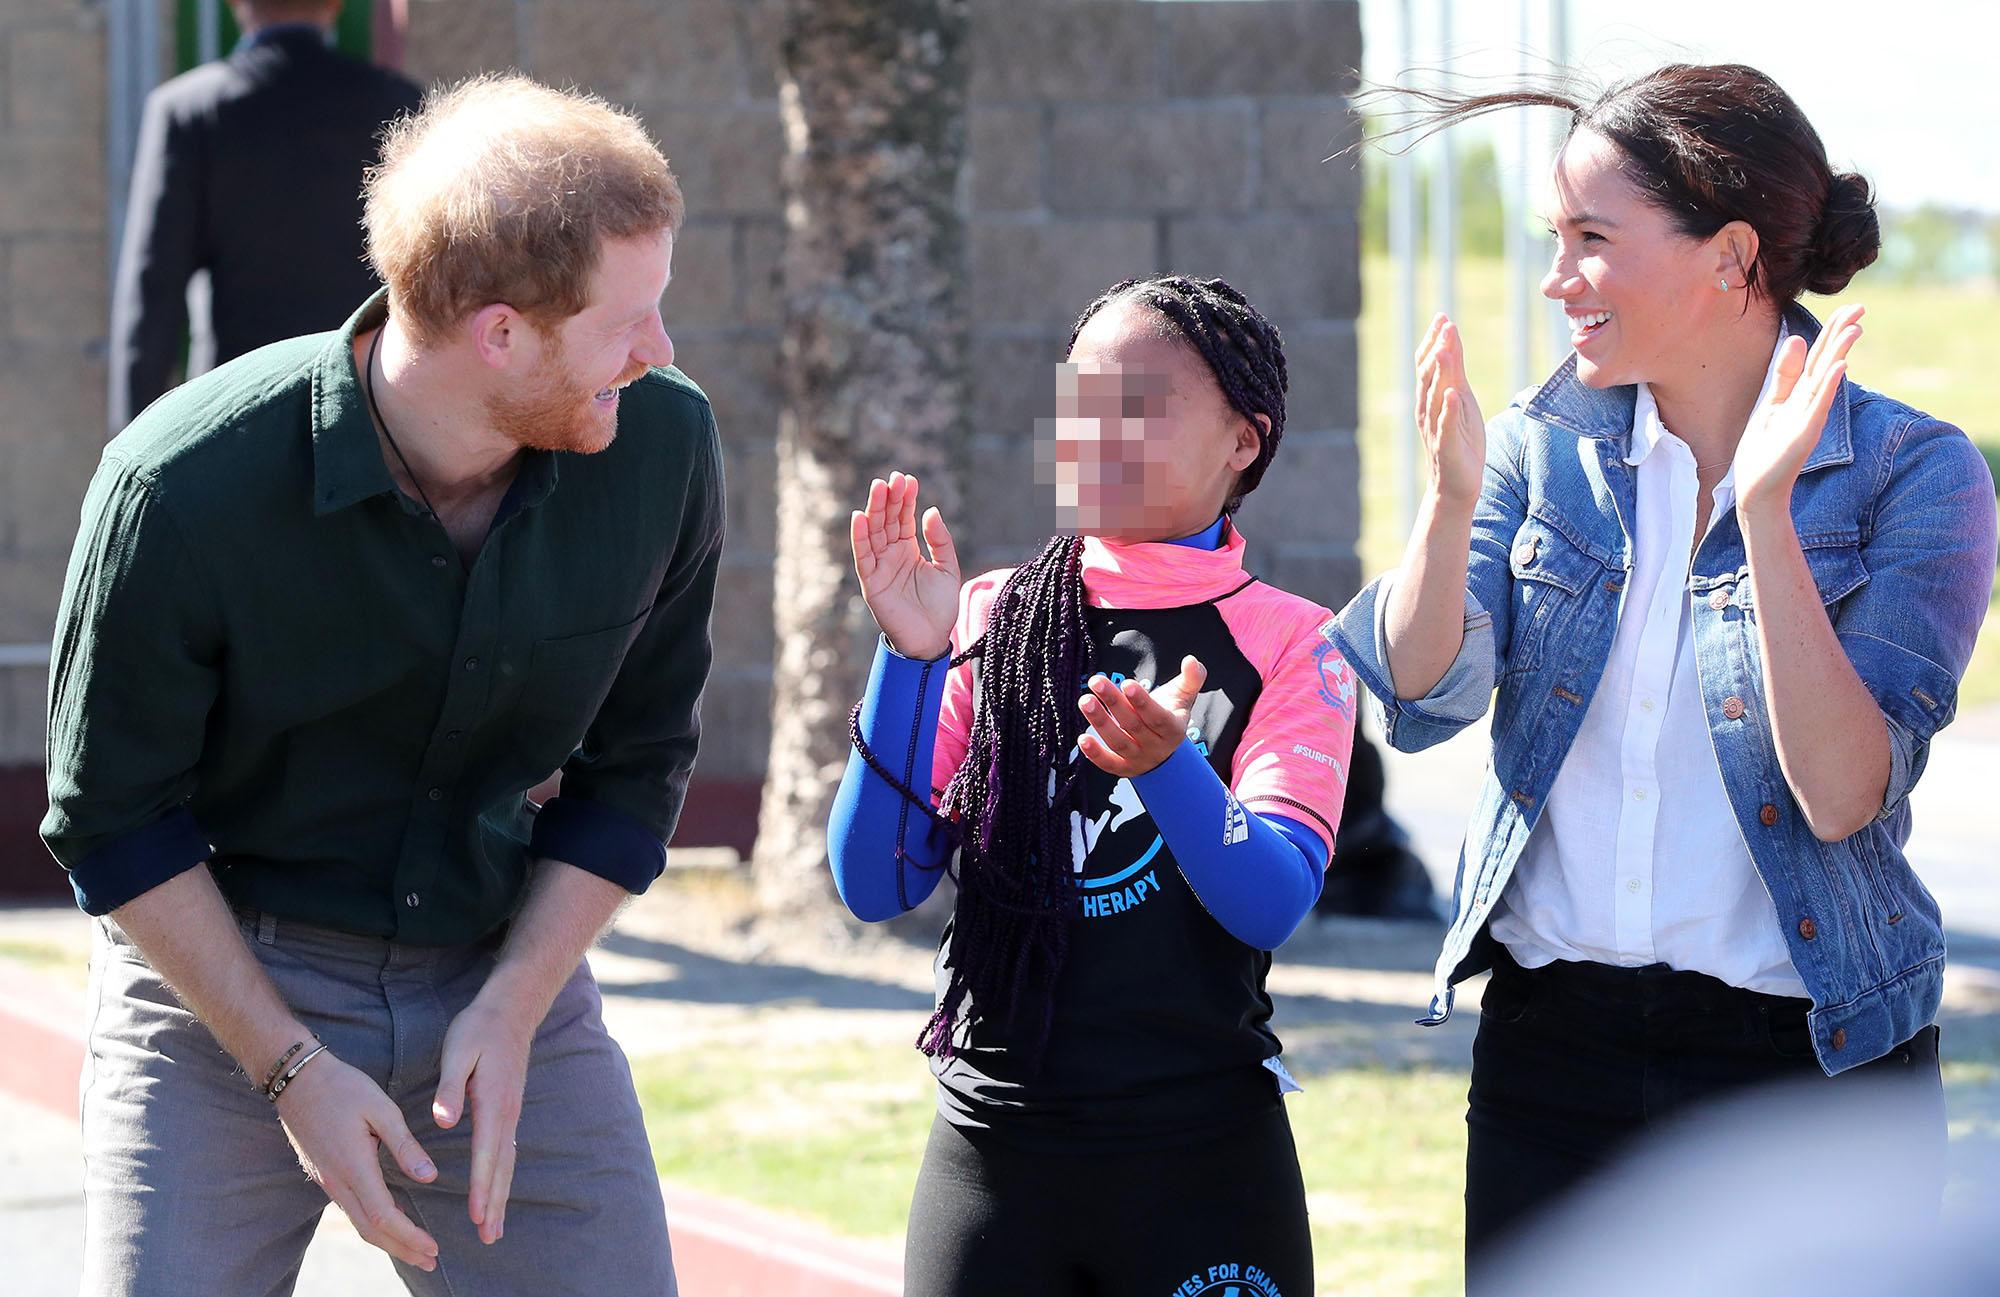 Harry e Meghan sorridenti e sportivi tra i bimbi africani